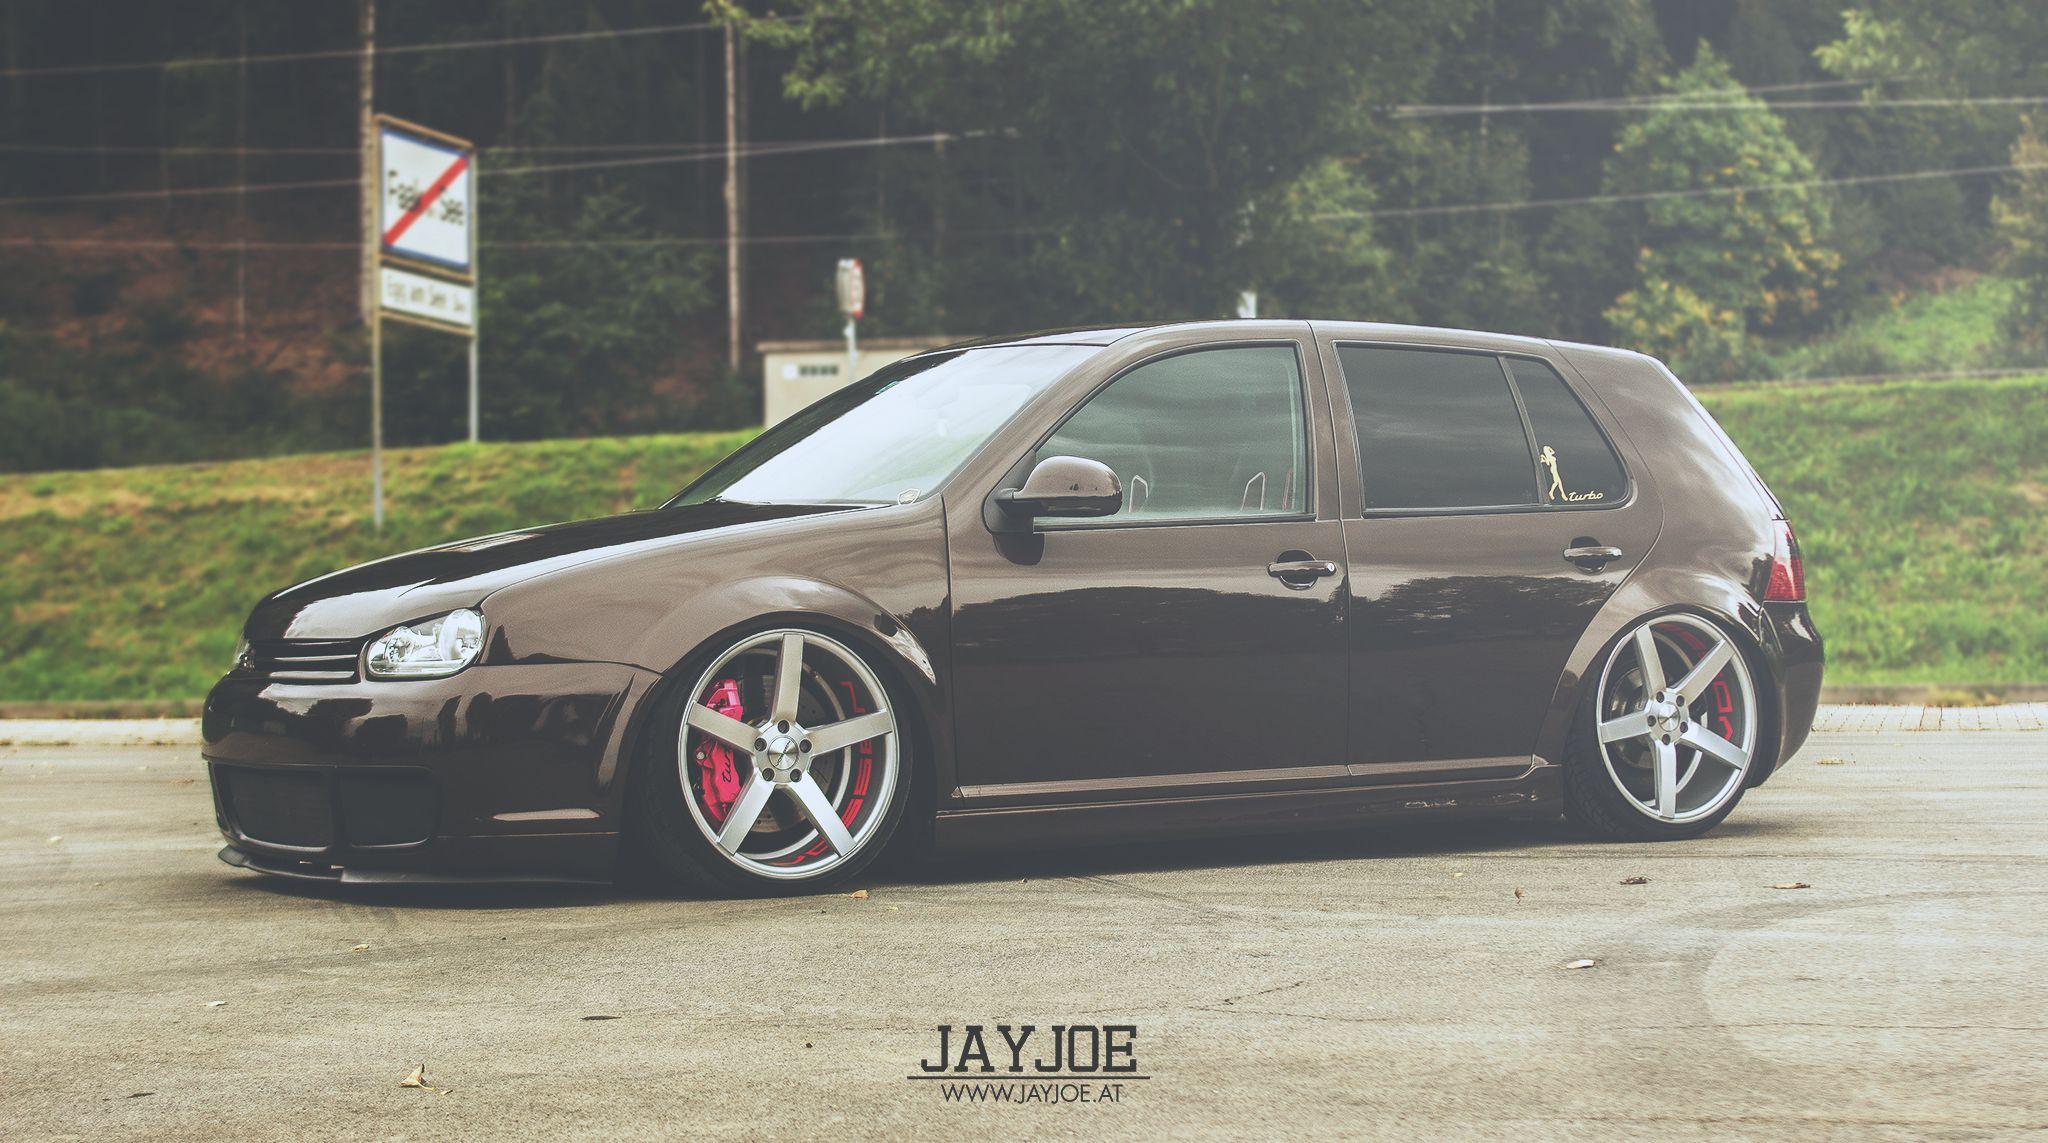 VW GOLF MK4 GTI www.jayjoe.at | VDUBS | Pinterest | Golf ...